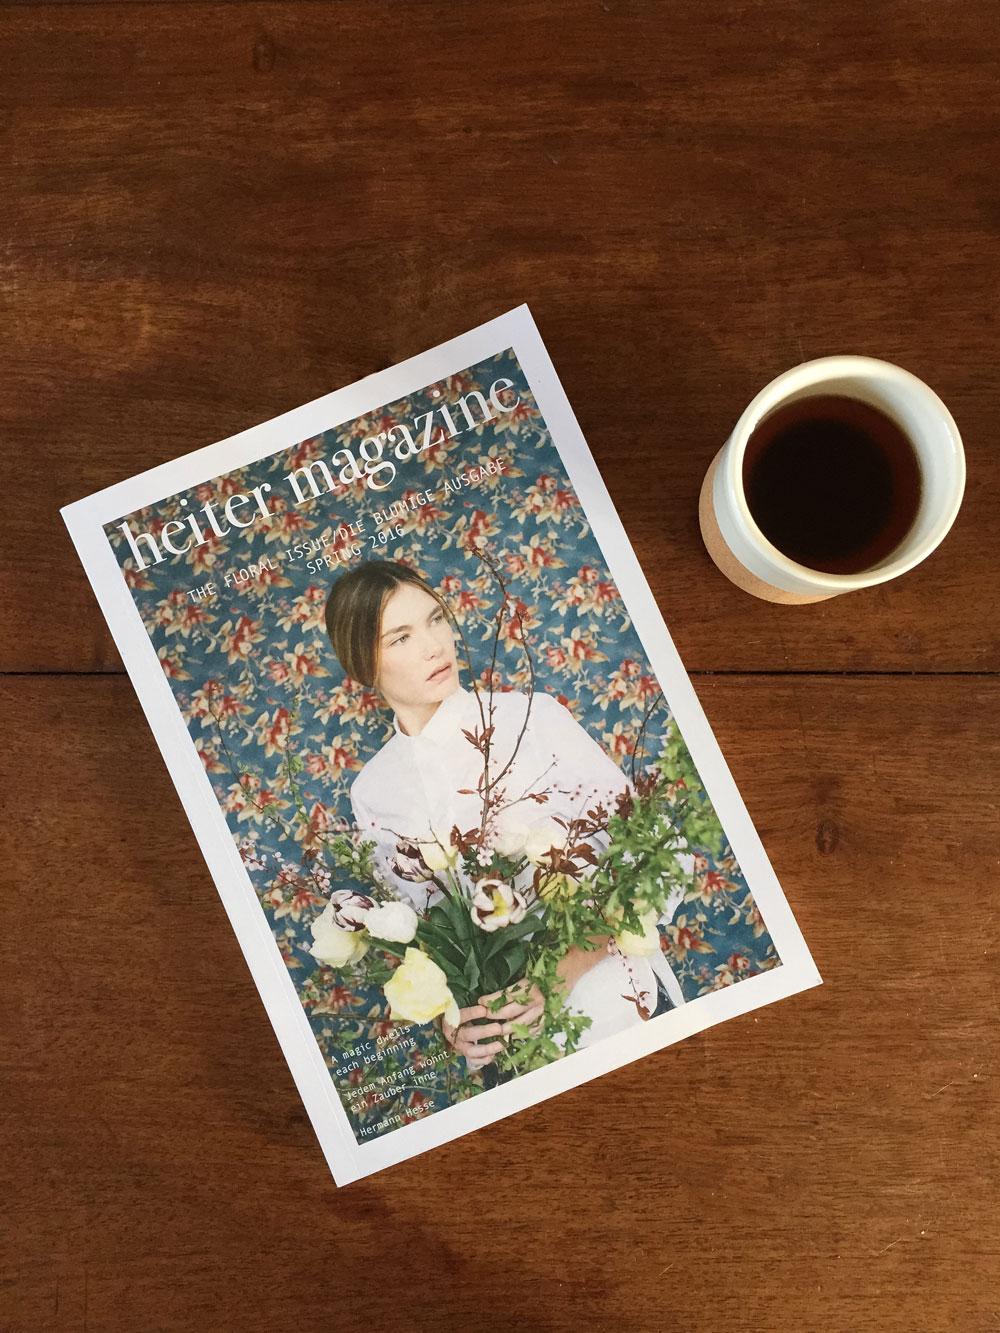 heiter magazine by Katharina